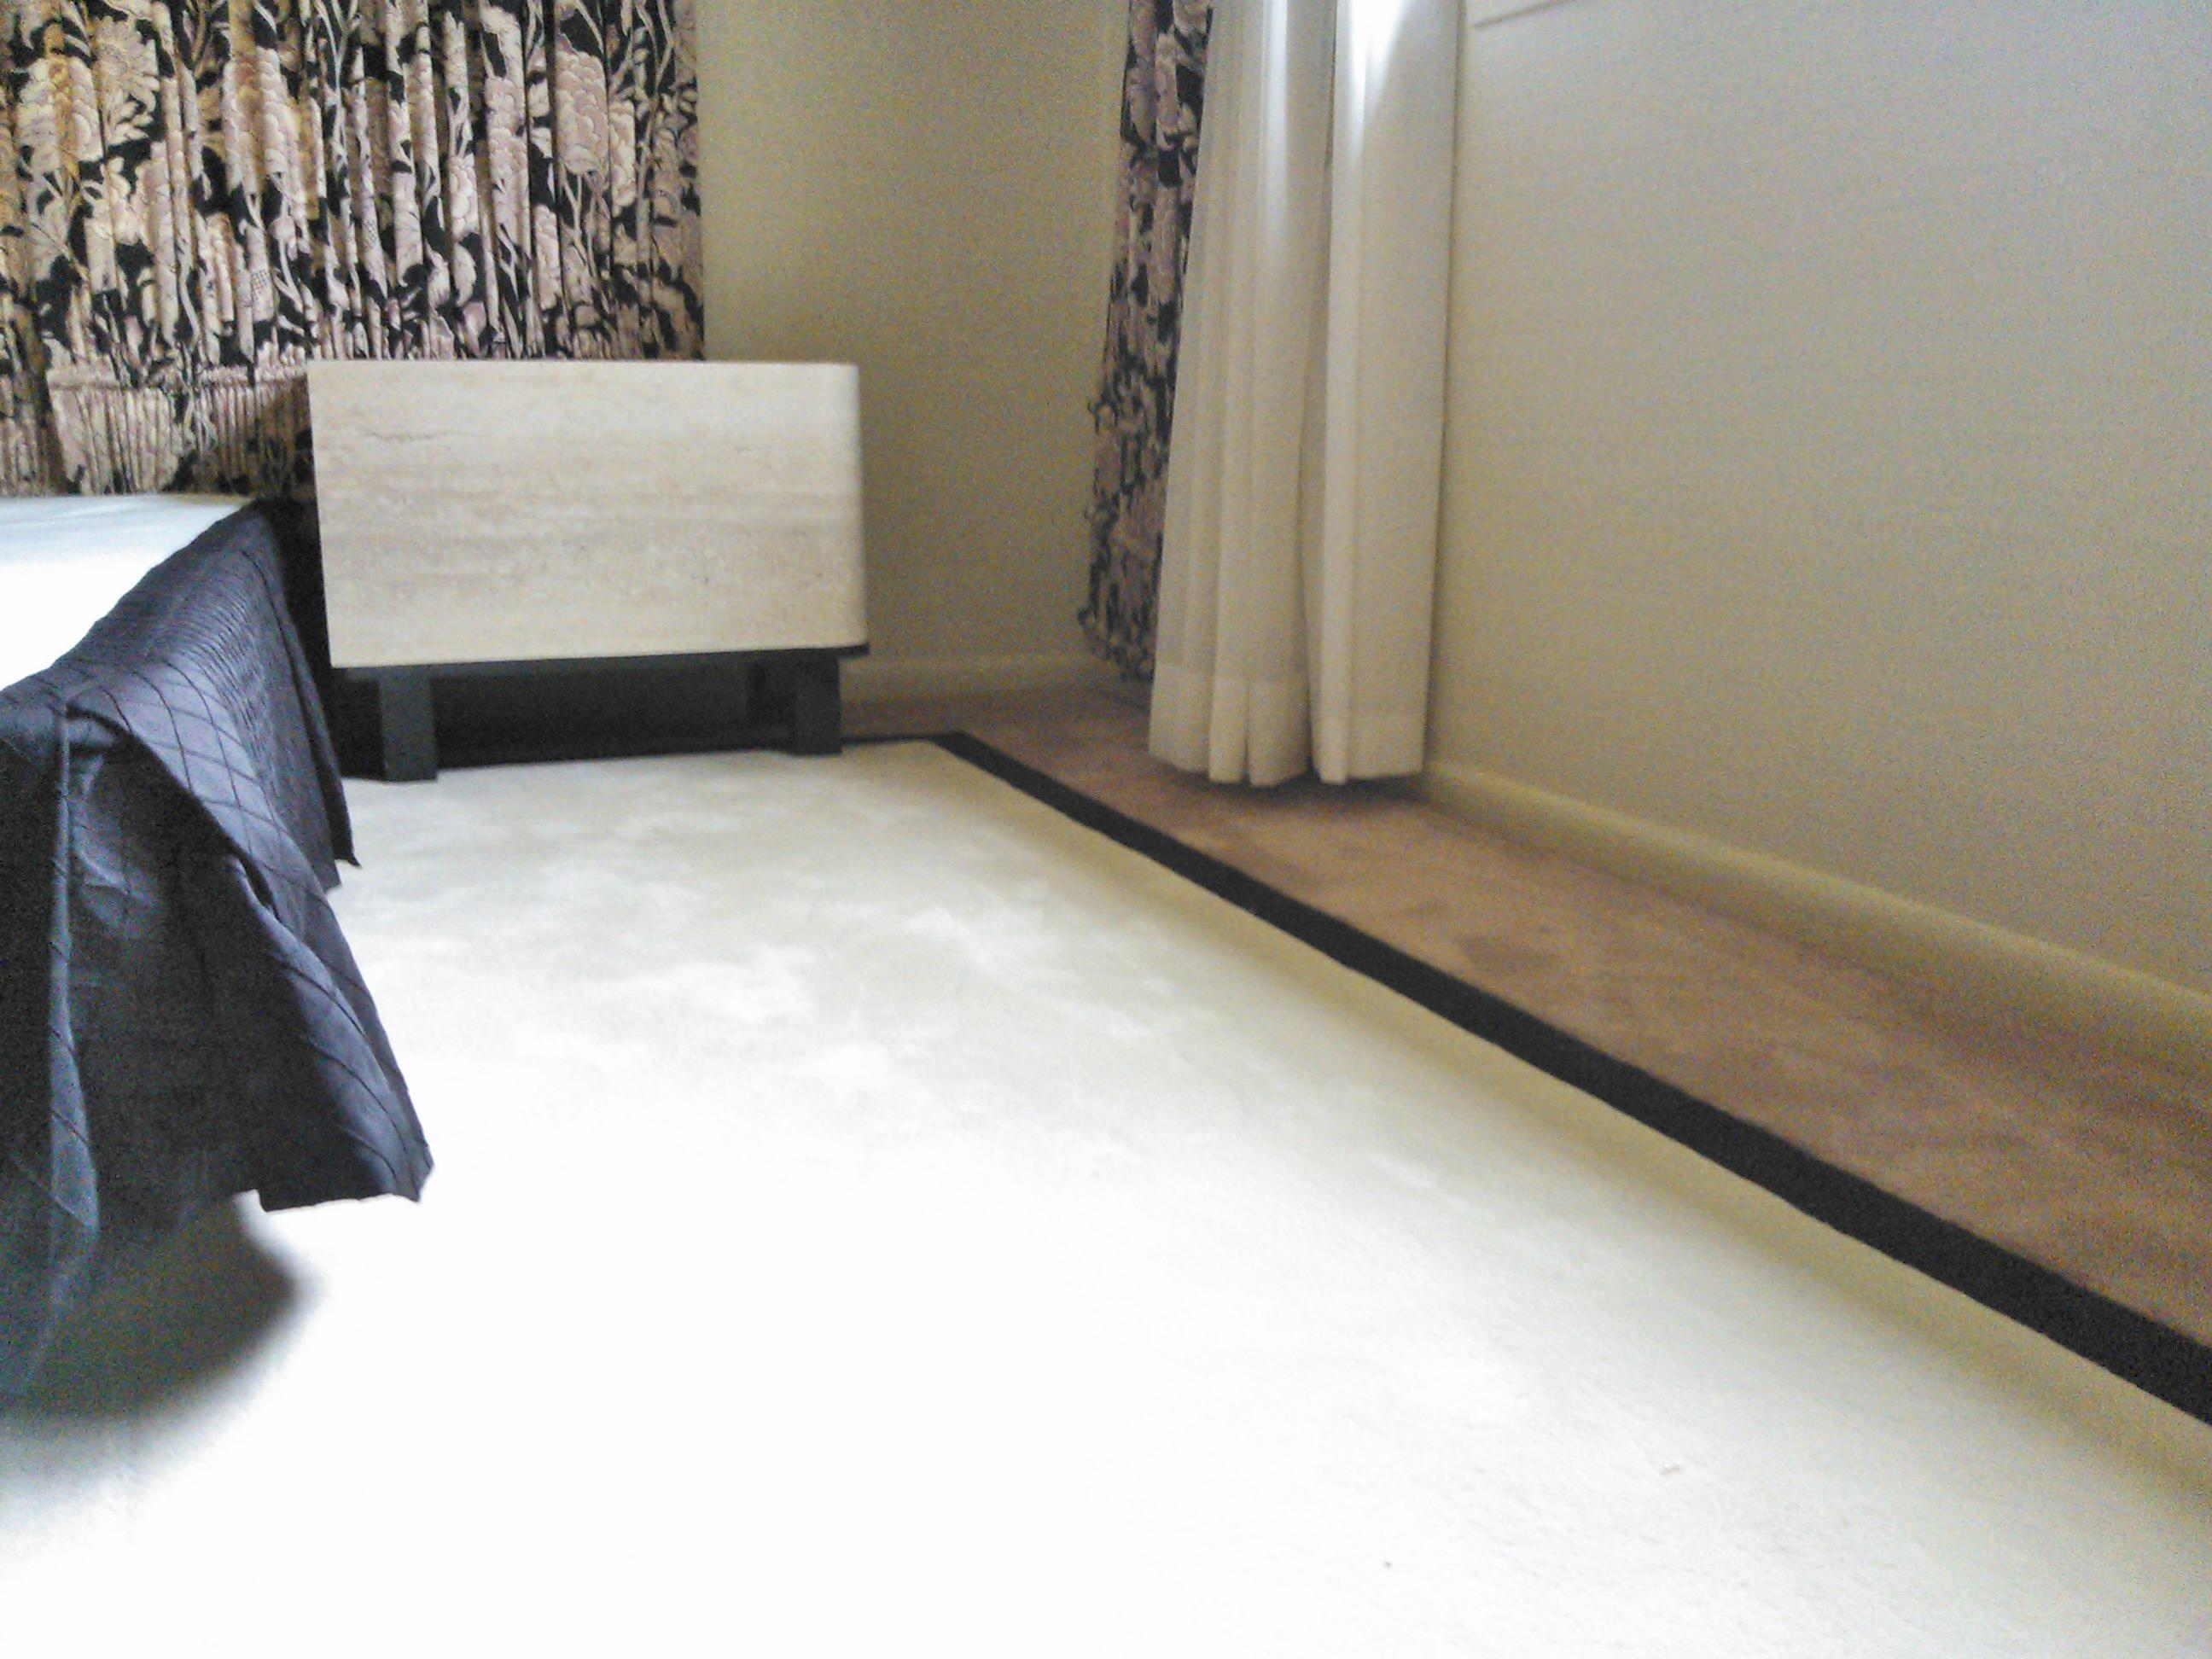 Carpet Installers in West Bloomfield, Michigan